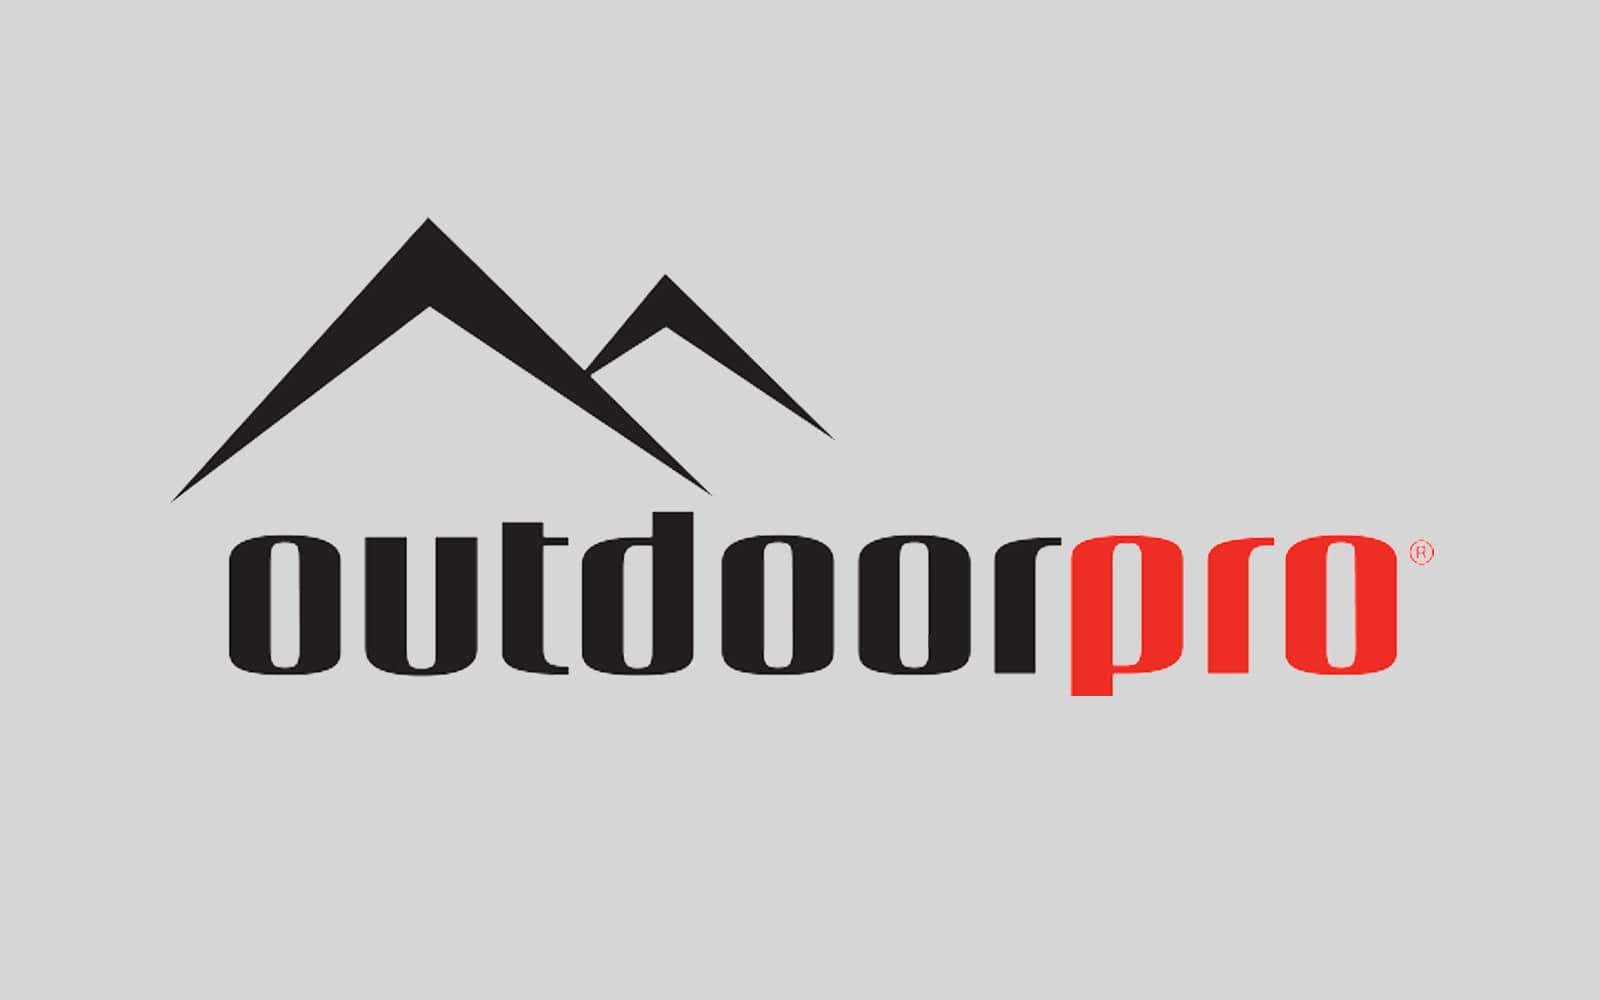 Logo_sponsor_Outdoorpro